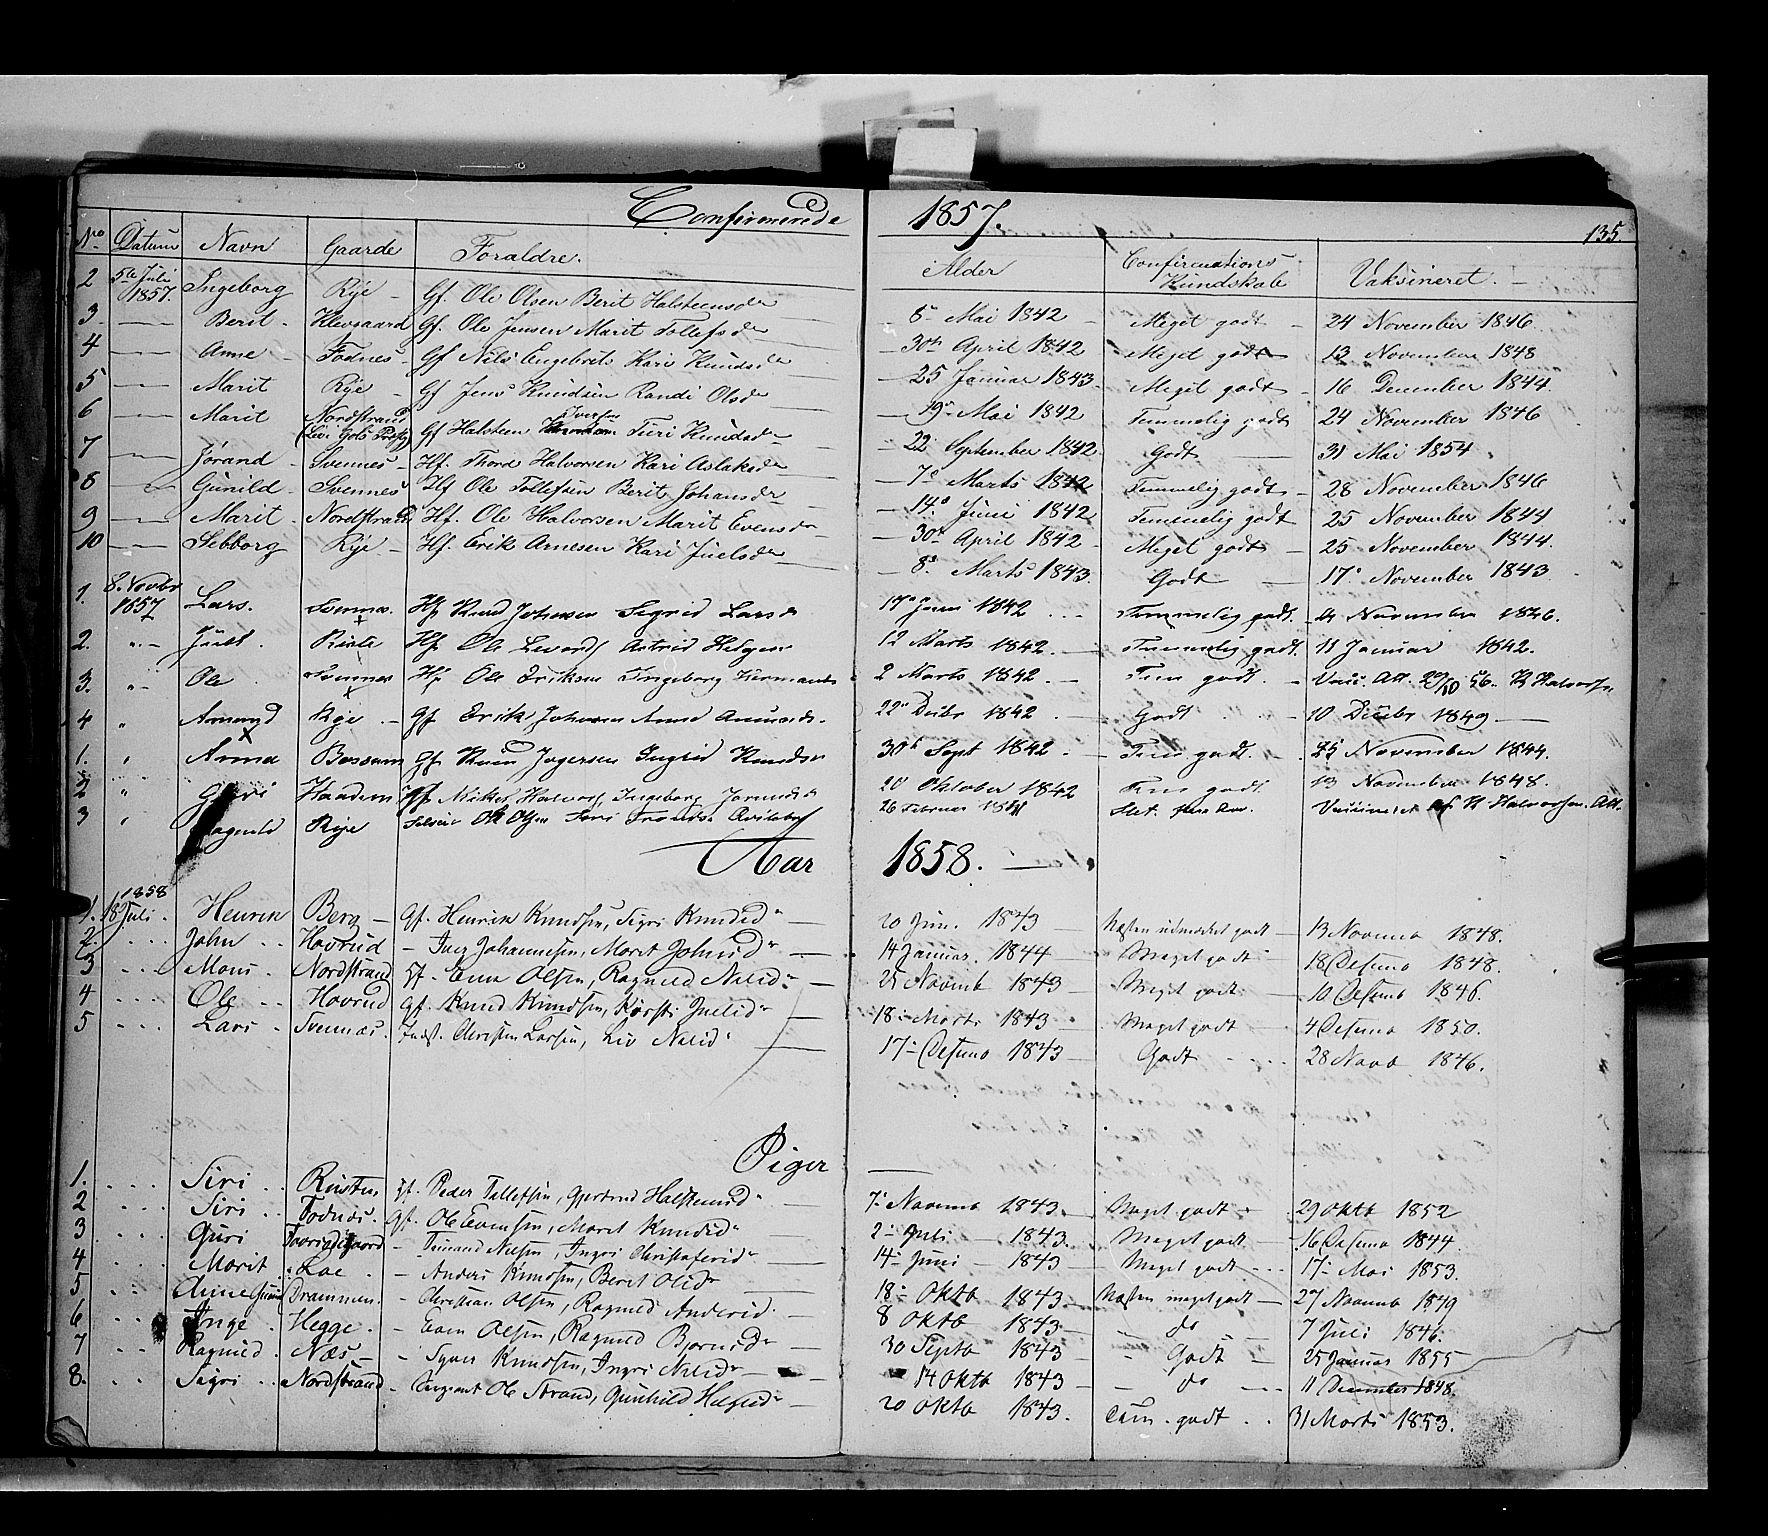 SAH, Nord-Aurdal prestekontor, Ministerialbok nr. 5, 1842-1863, s. 135